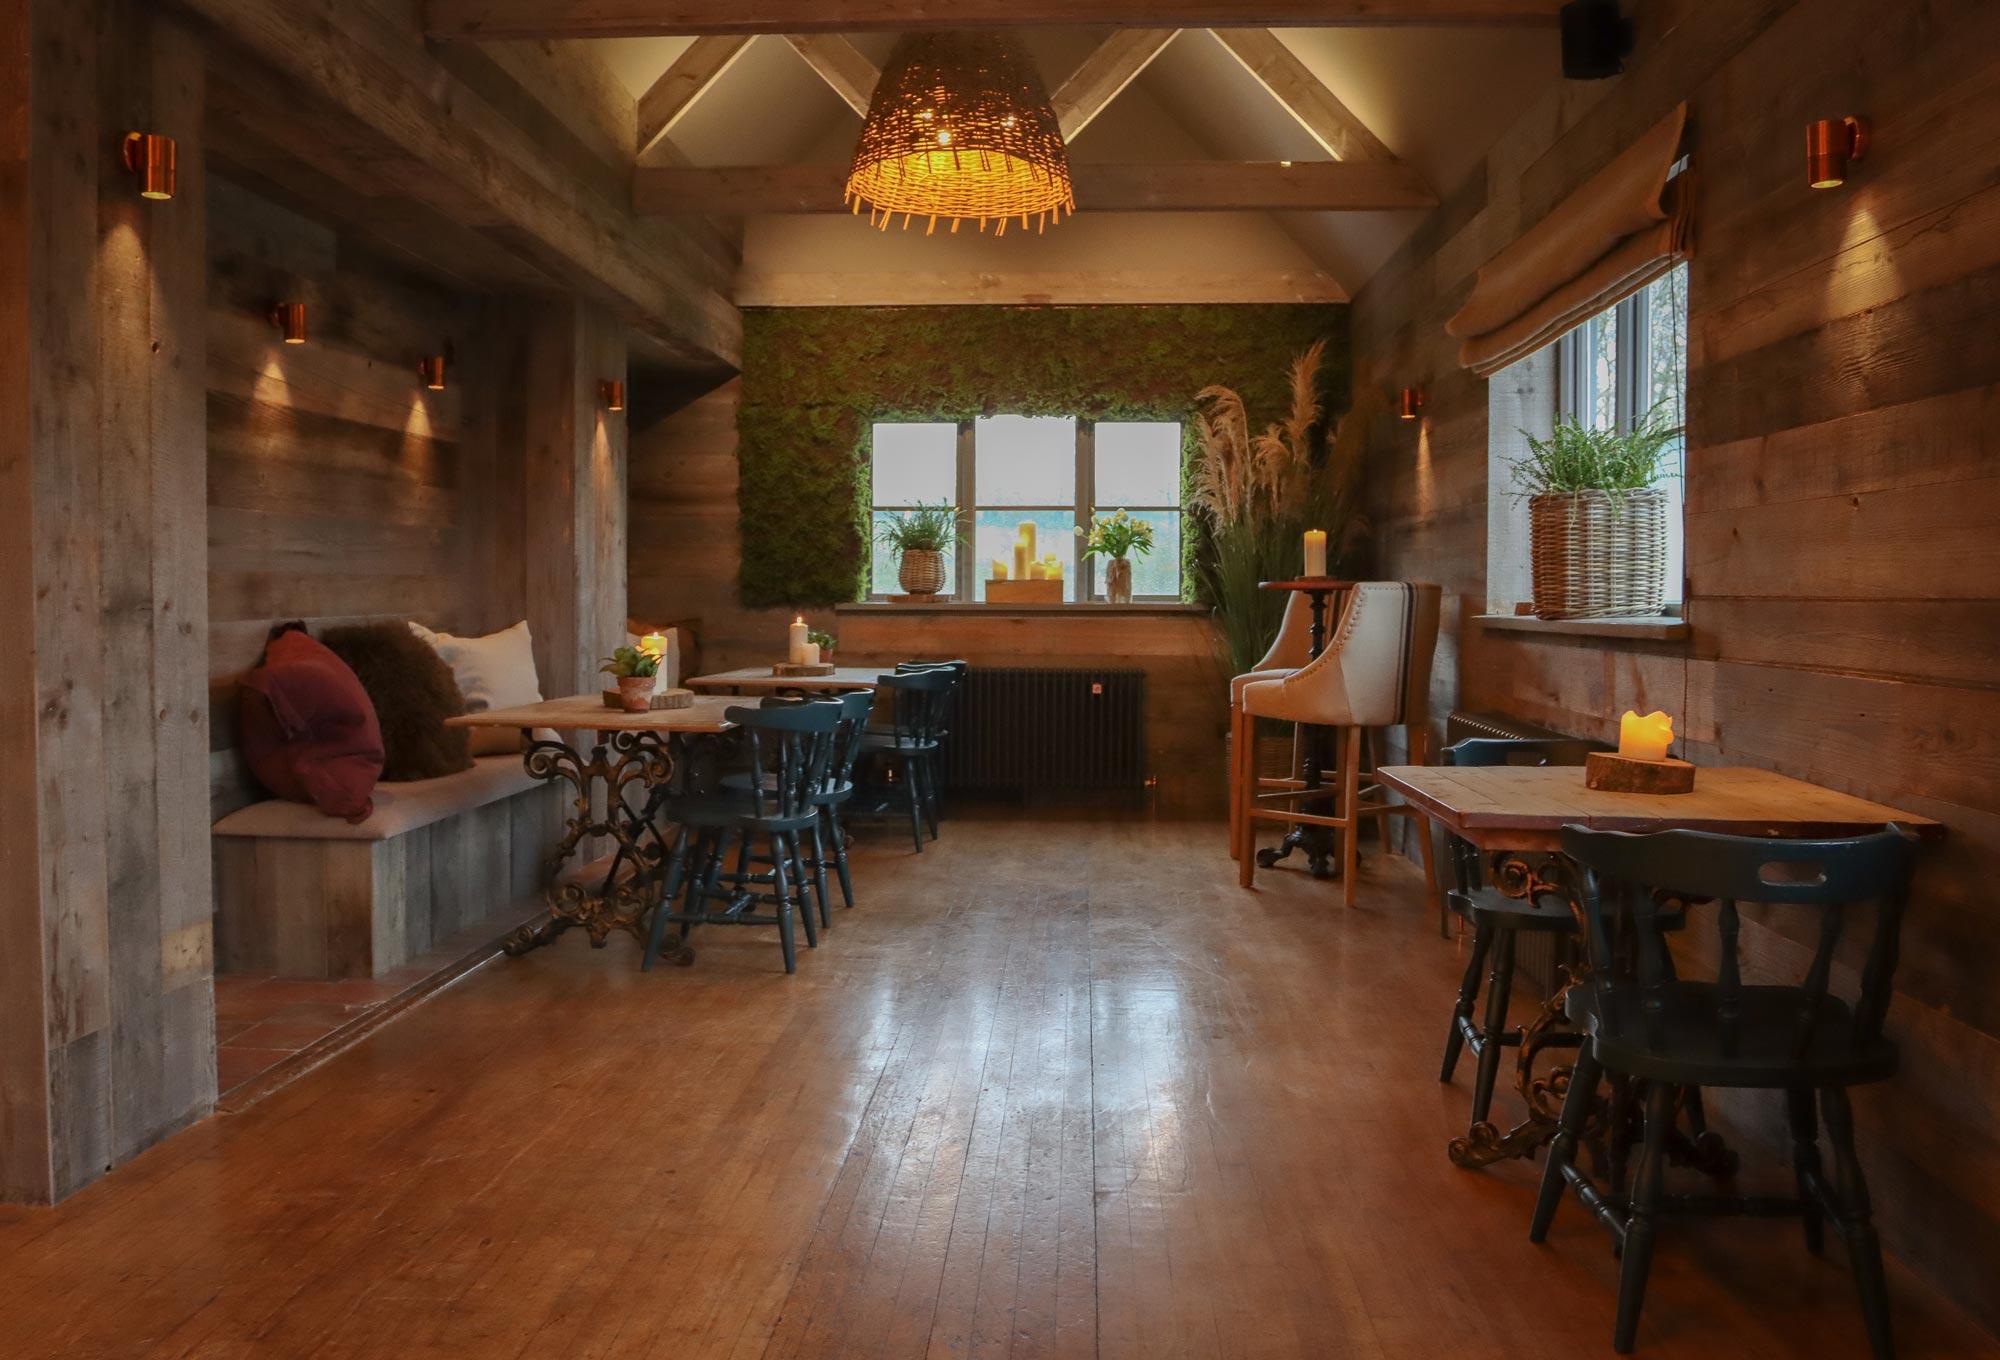 Rustic bar interior